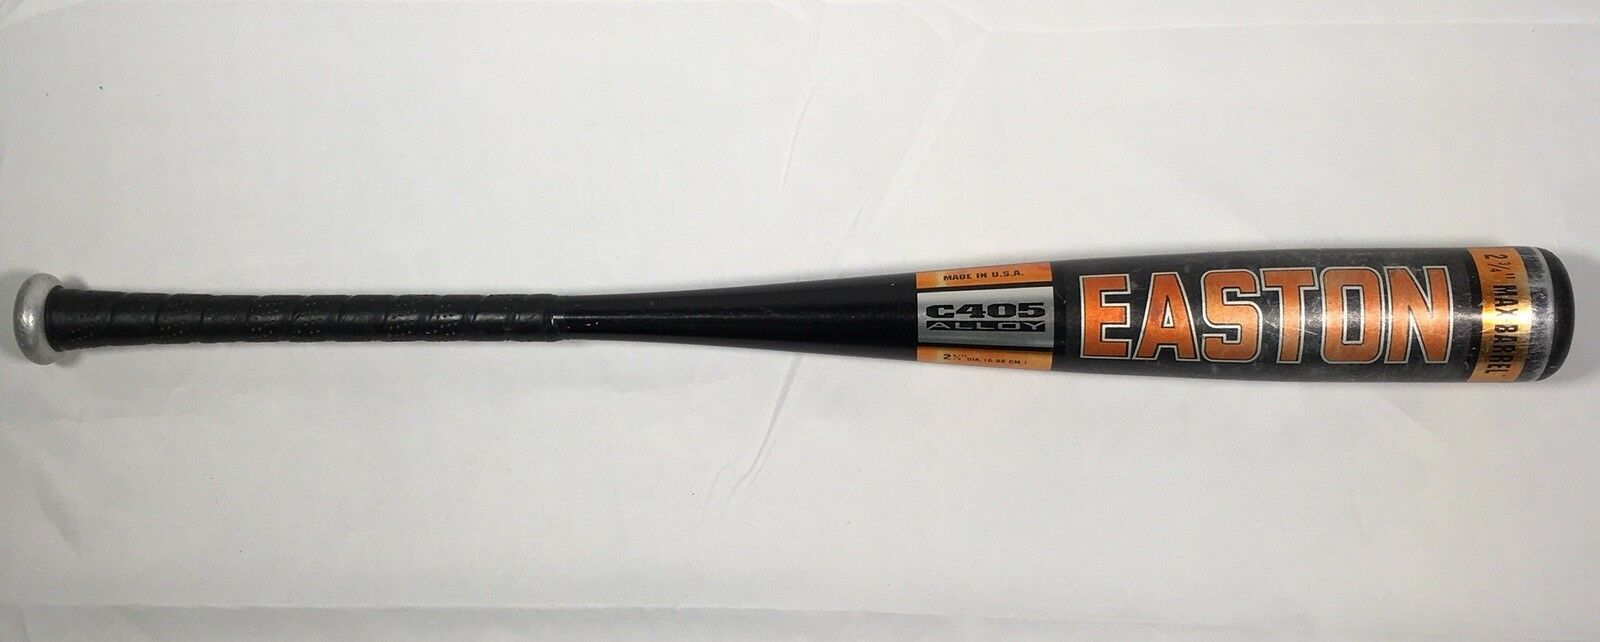 Easton Reflex BRX5E C405 bate de béisbol 31  26 OZ. 2 3 4  Max barril Hecho en EE. UU.